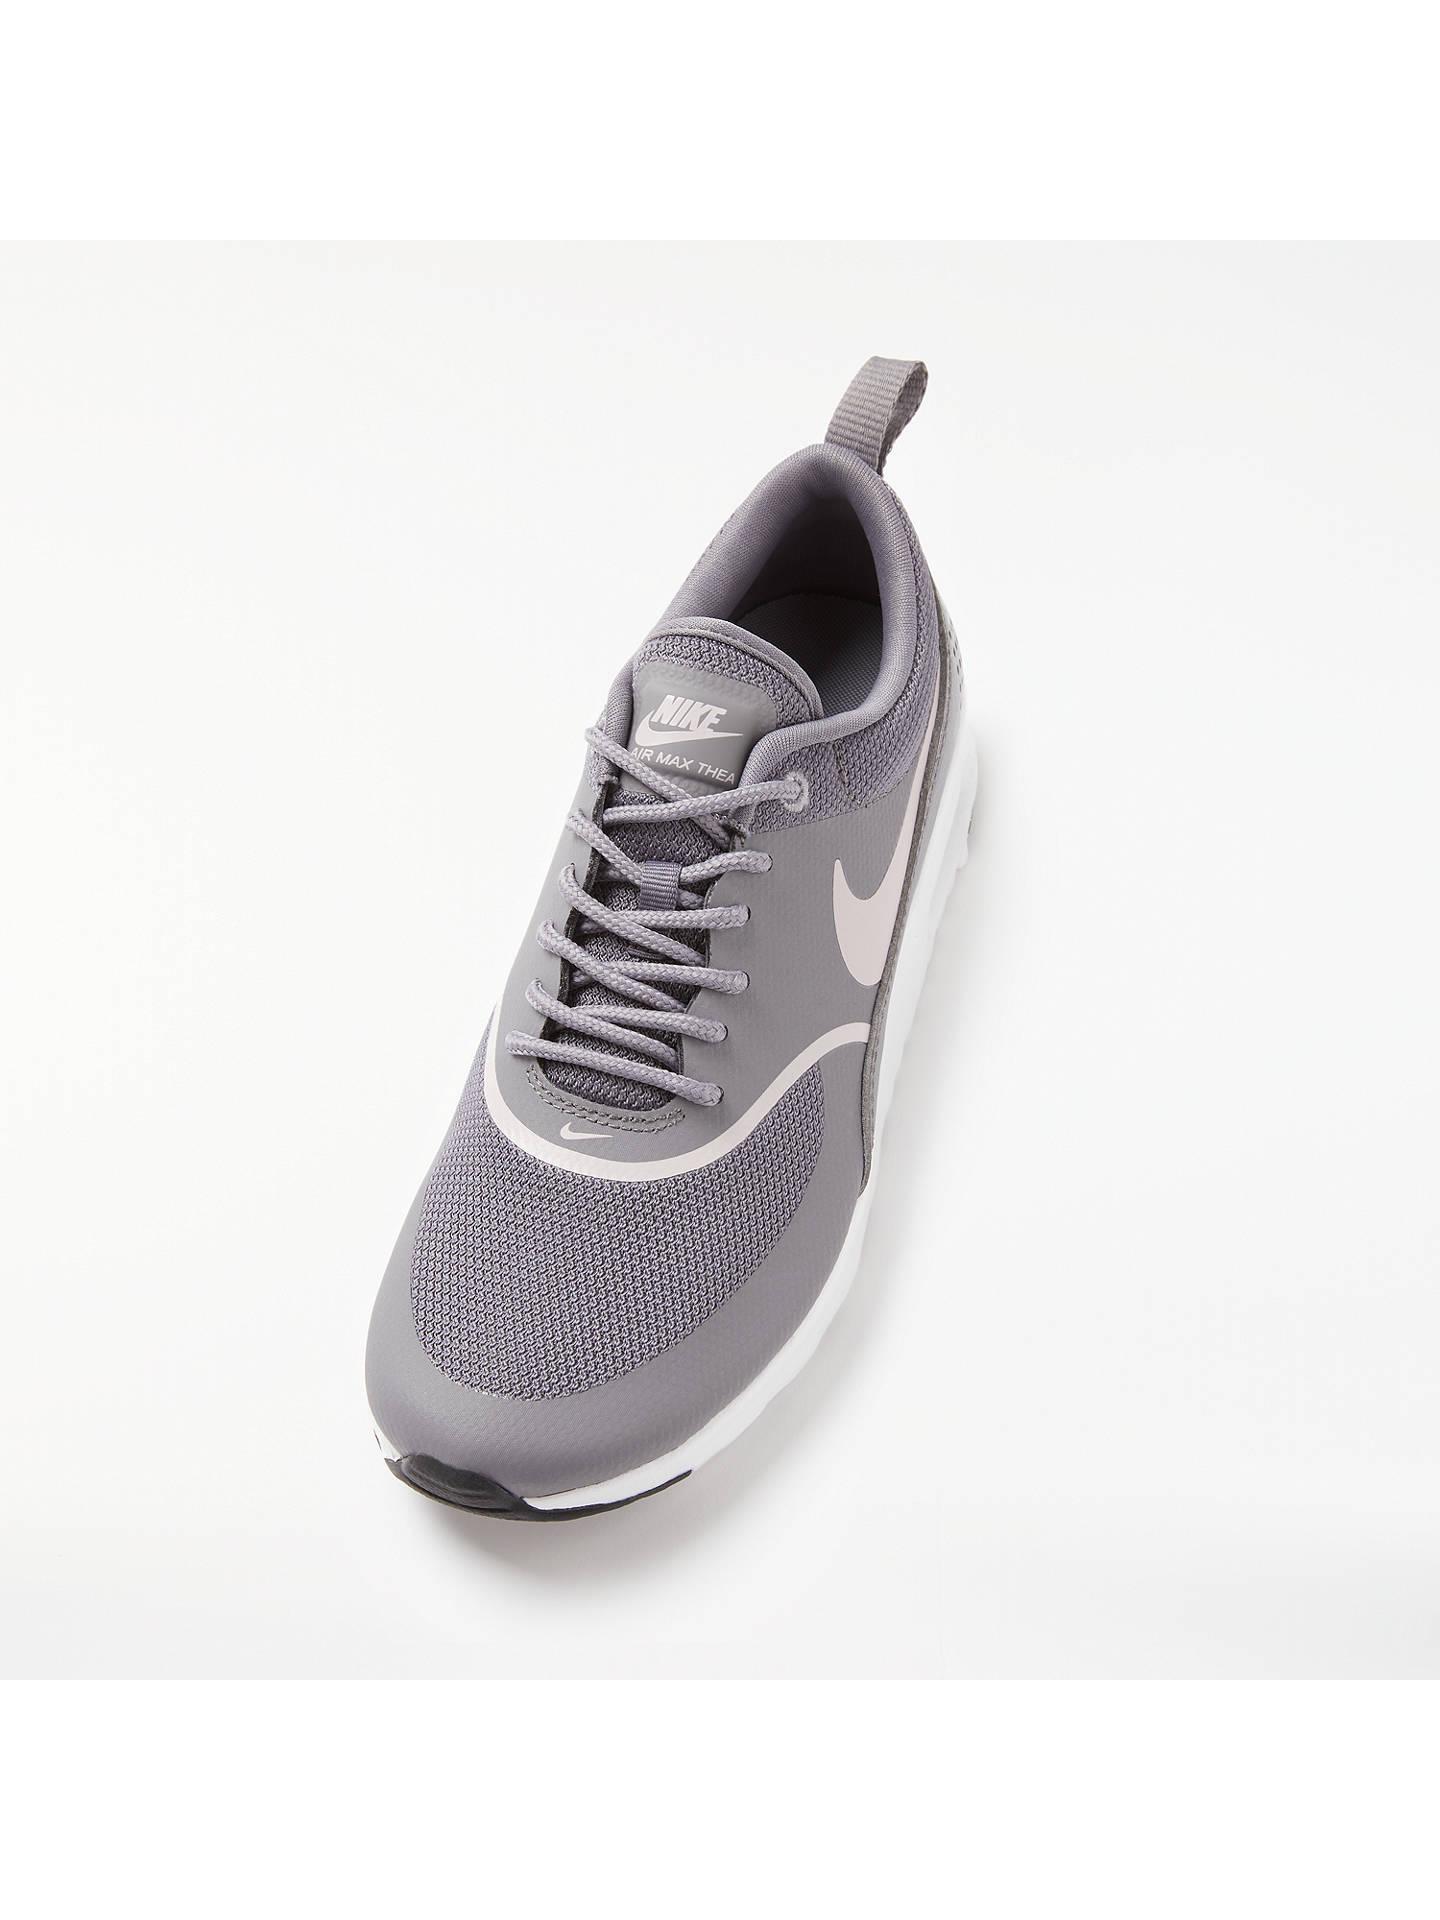 meilleur service 1043c 4d9c6 Nike Air Max Thea Women's Trainers at John Lewis & Partners